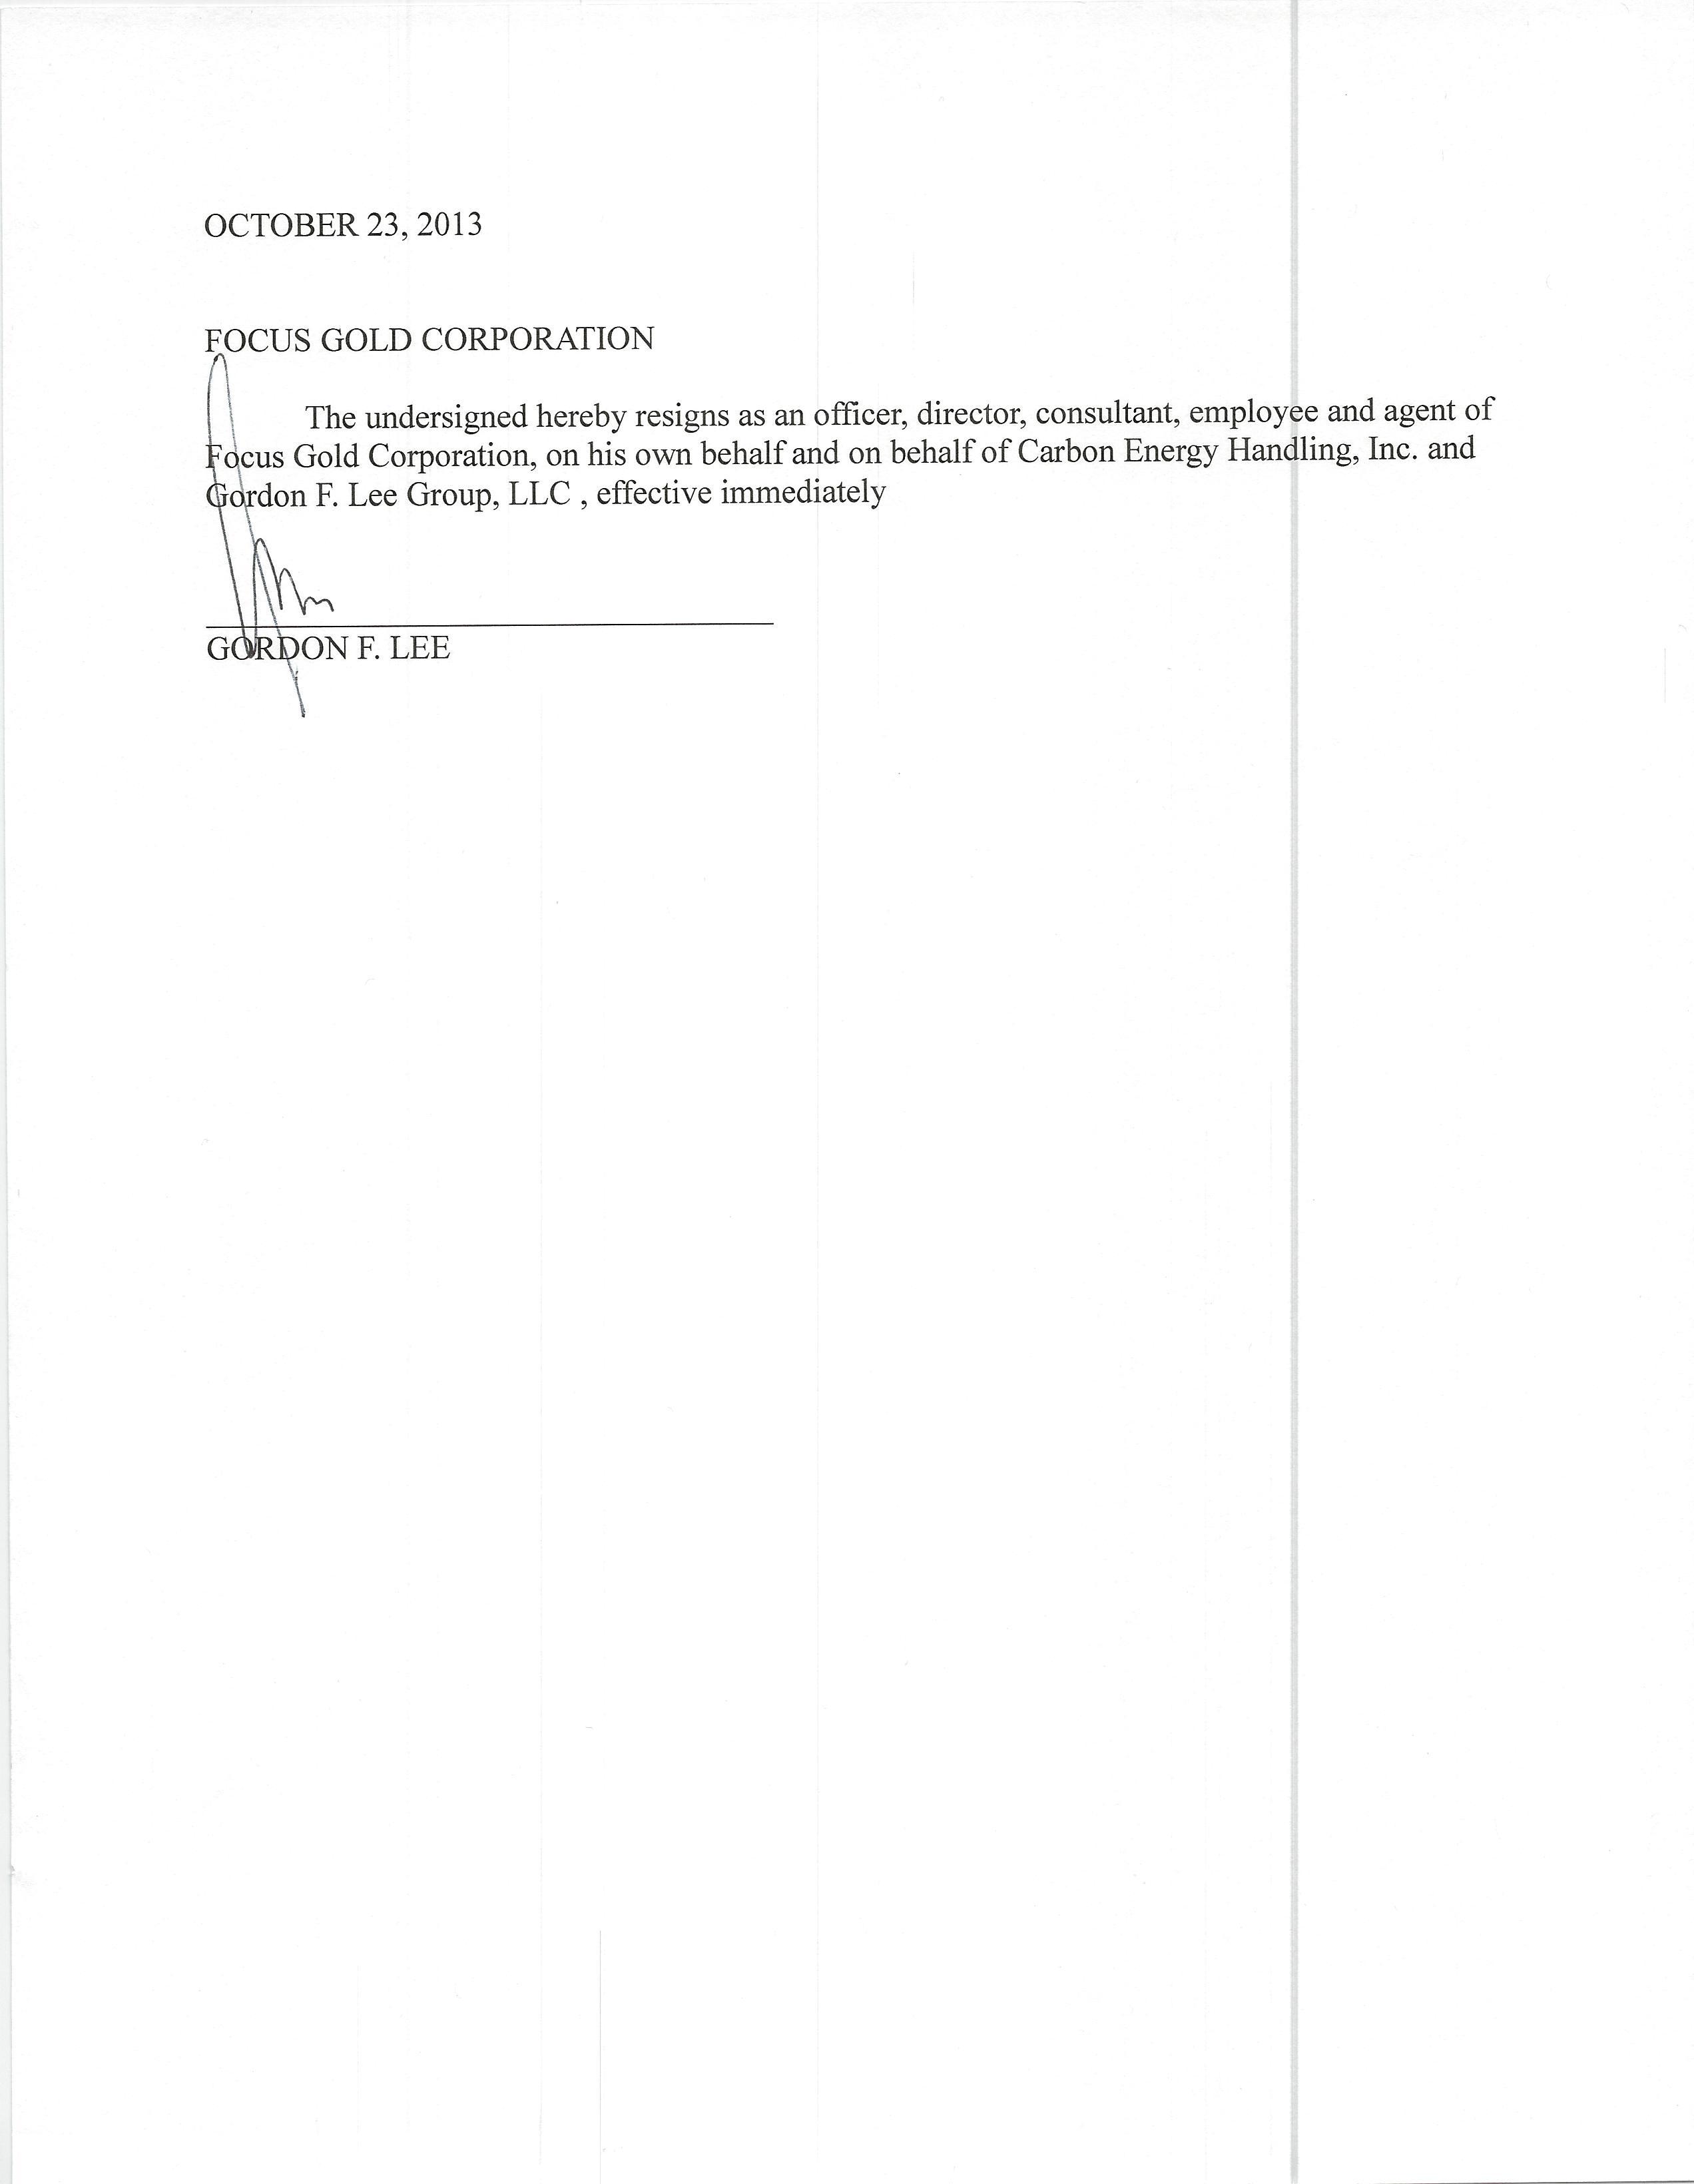 focus gold corp form 8 k ex 17 gordon f lee resignation letter